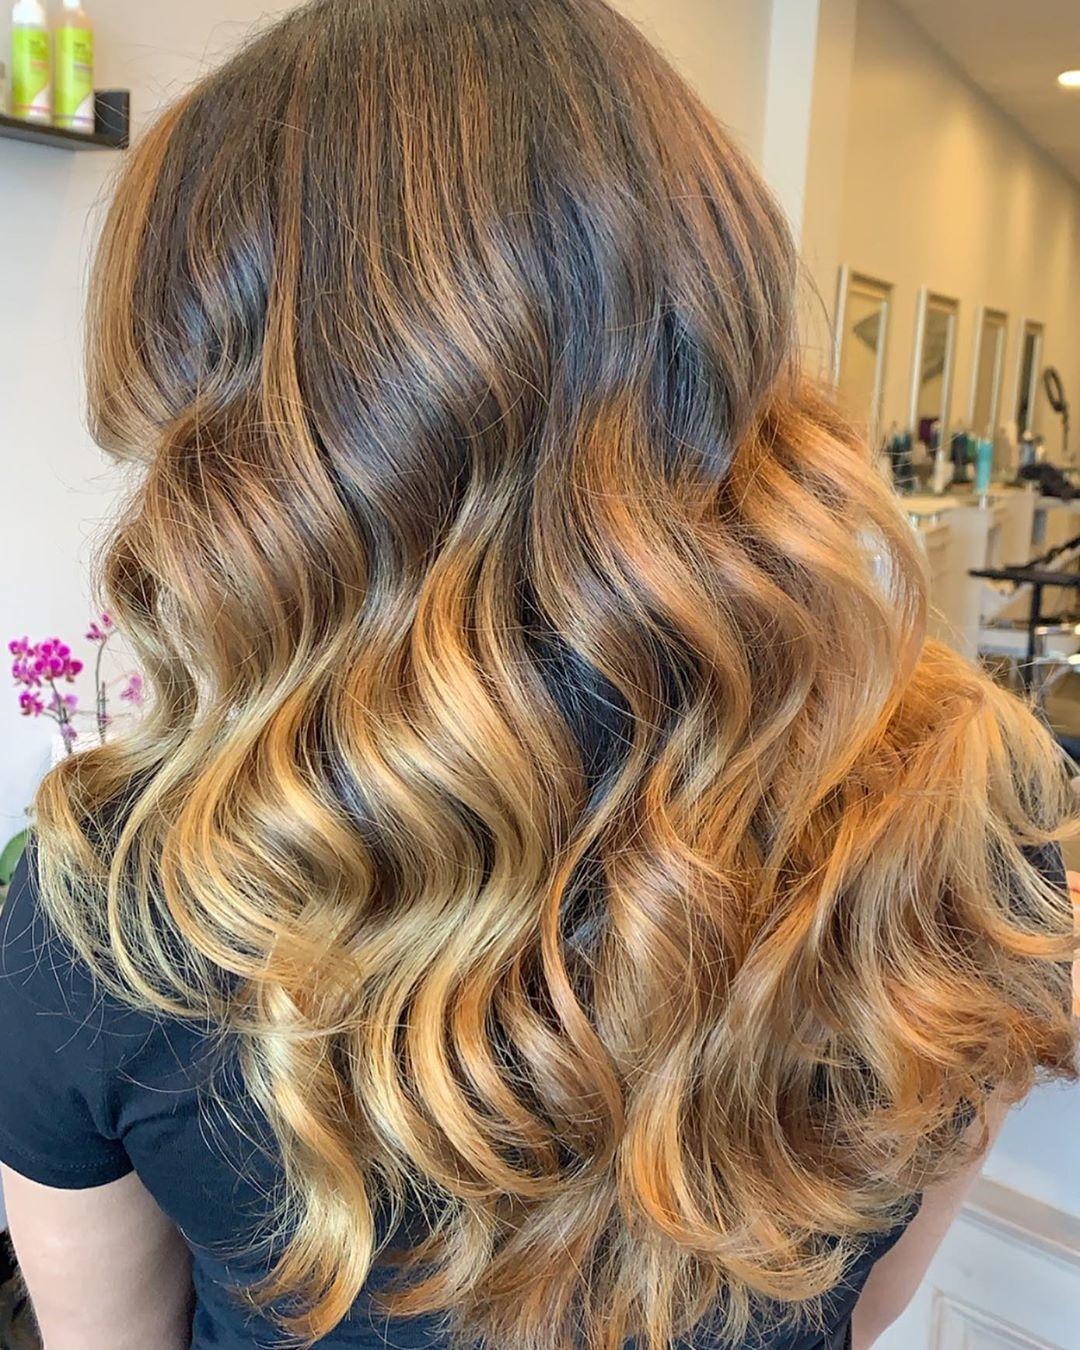 Caramel blonde hair Style Trends – The Modern Model